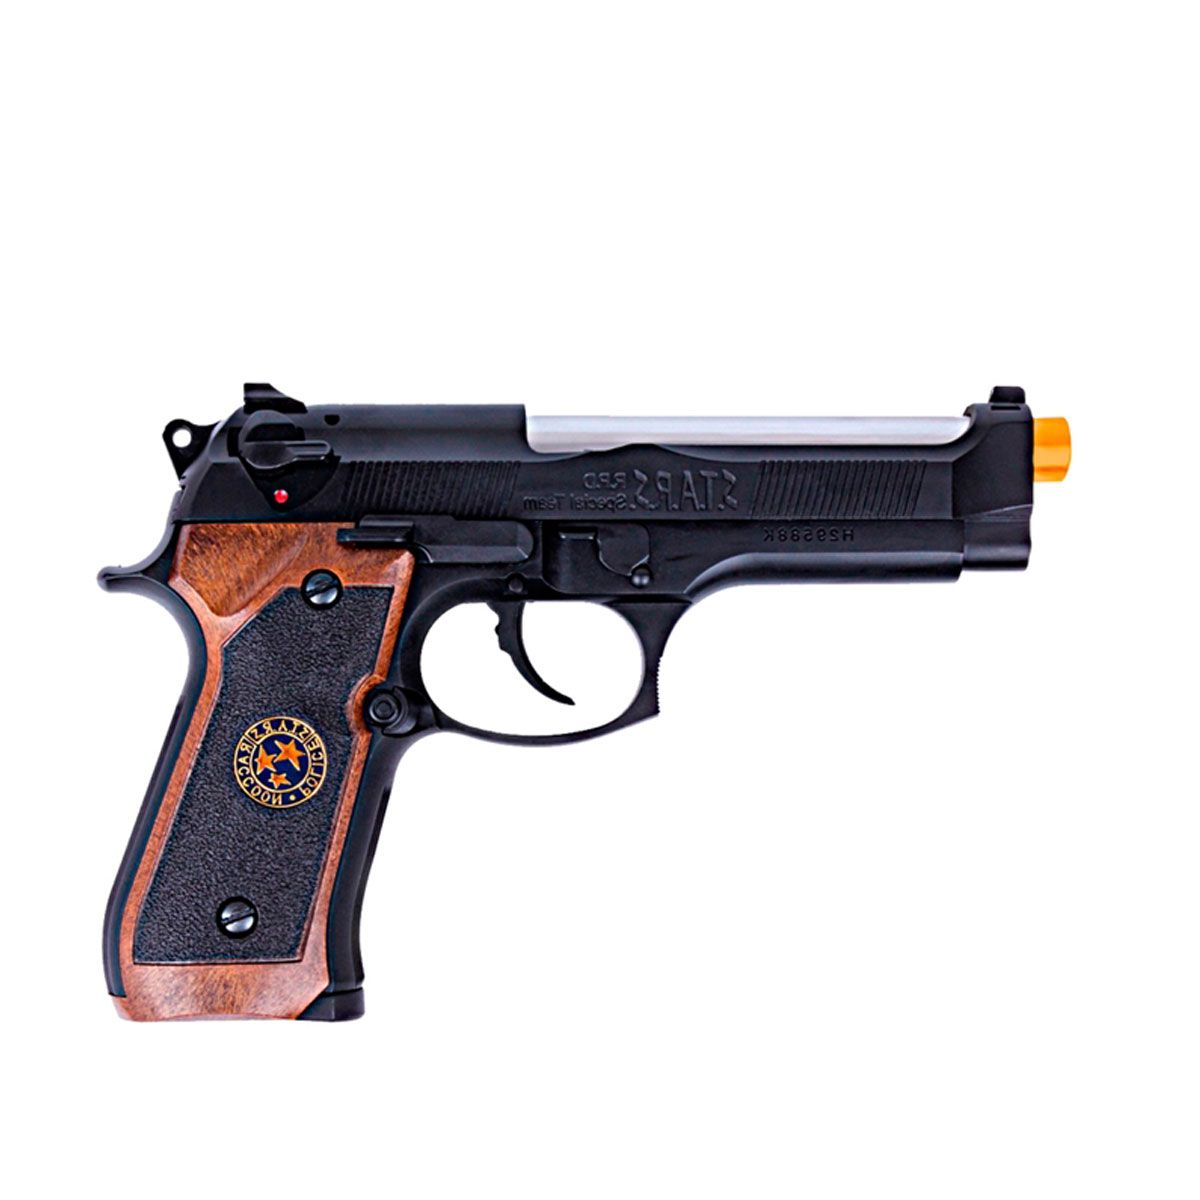 Pistola Airsoft M92 Biohazard Full Metal GBB - WE